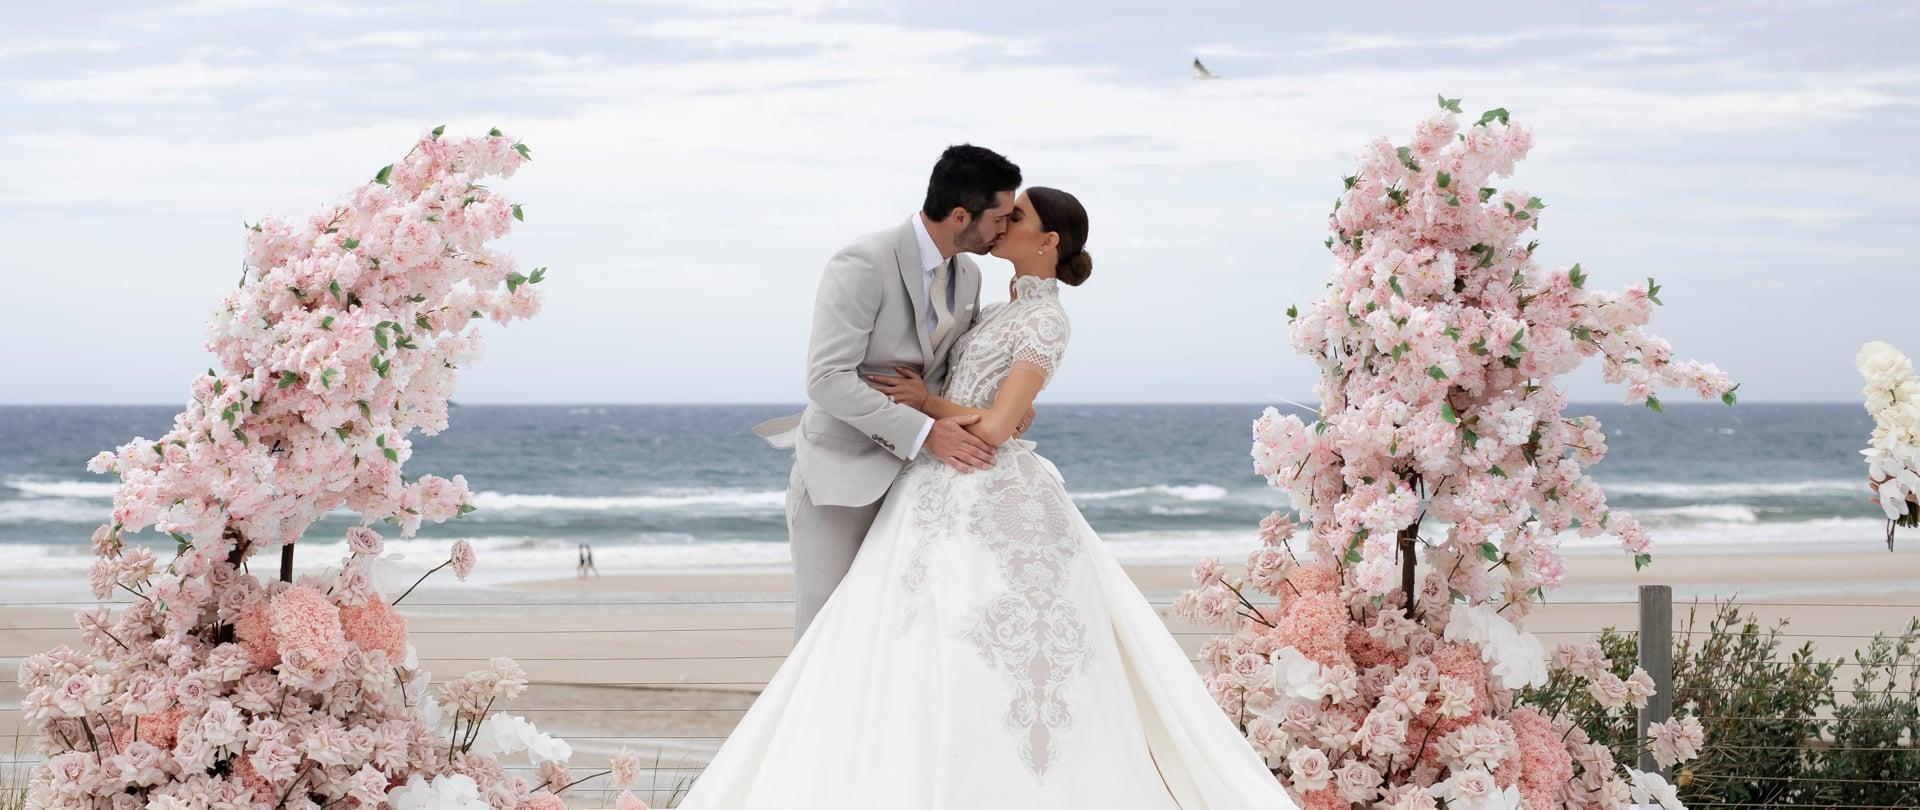 Erin & Ben Wedding Video Filmed at Byron Bay, New South Wales